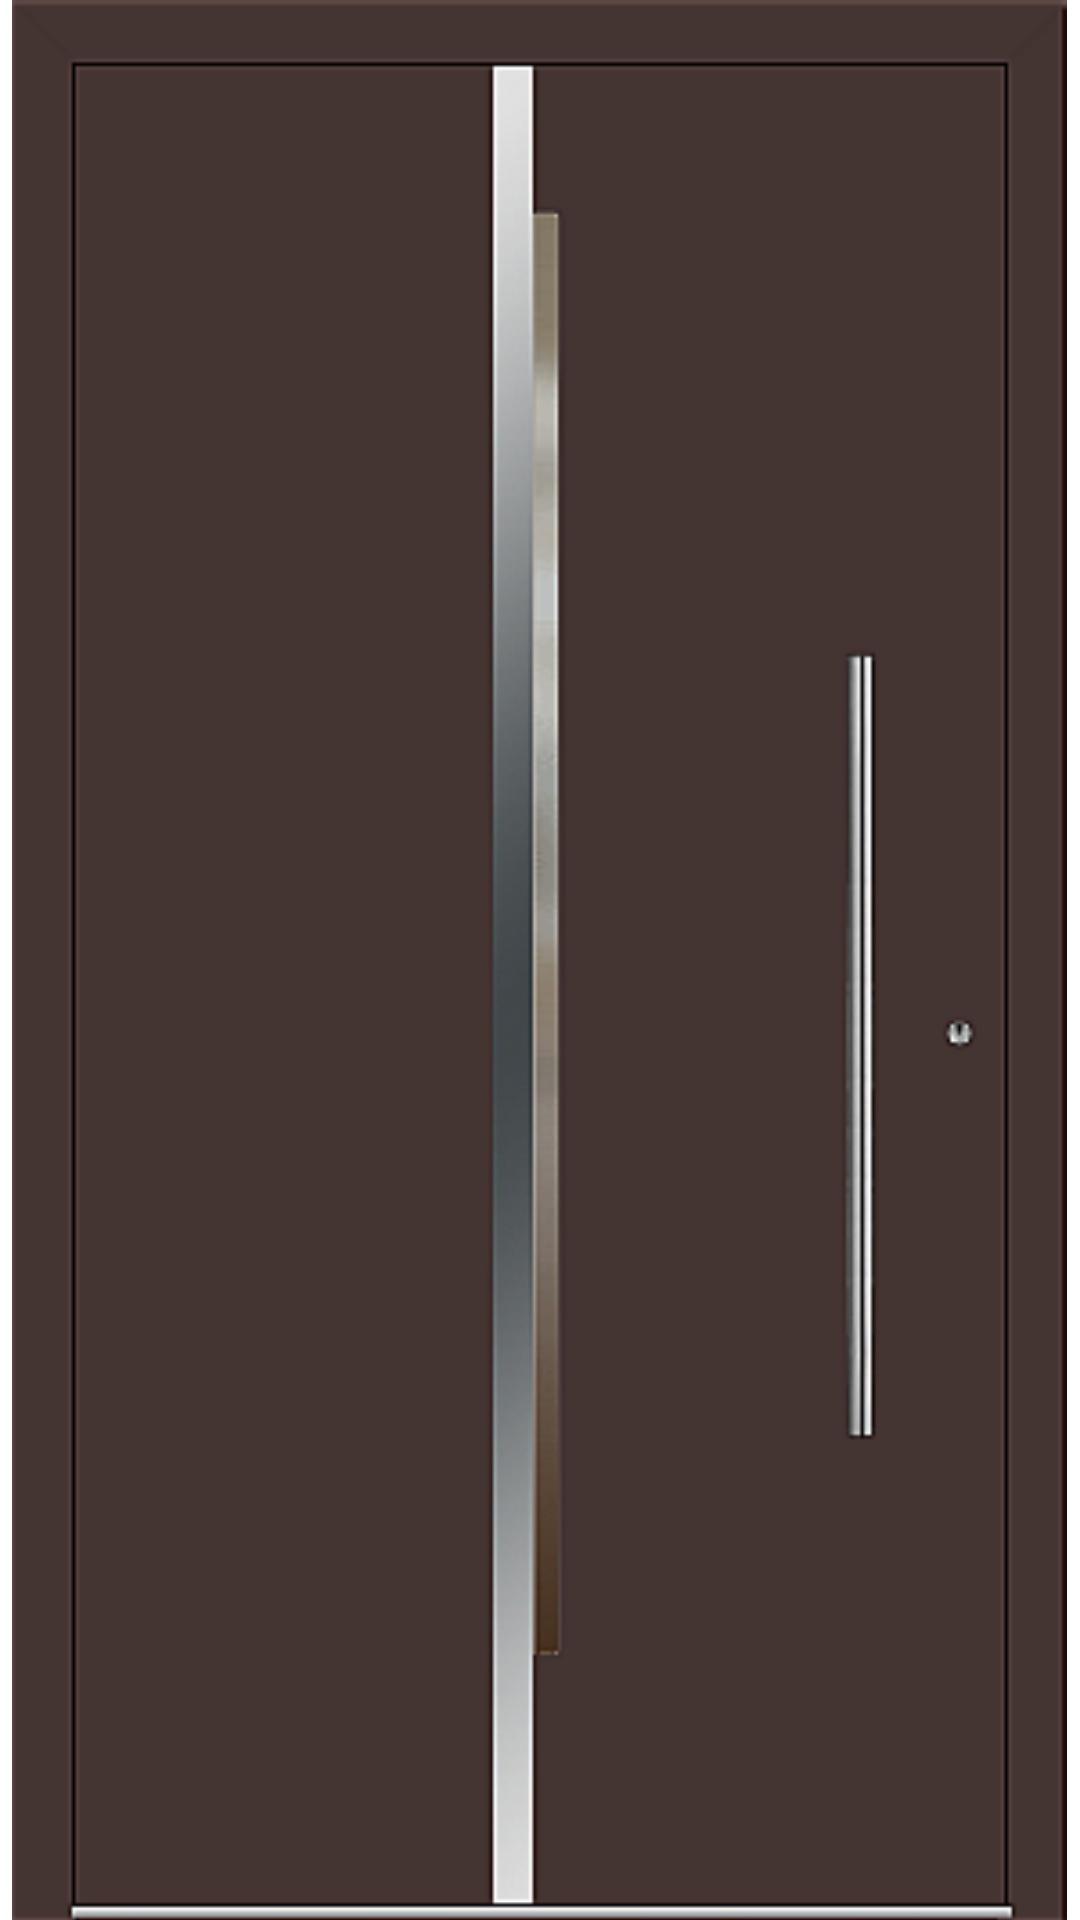 PaXentrée Aluminium Haustür M02201 mahagonibraun